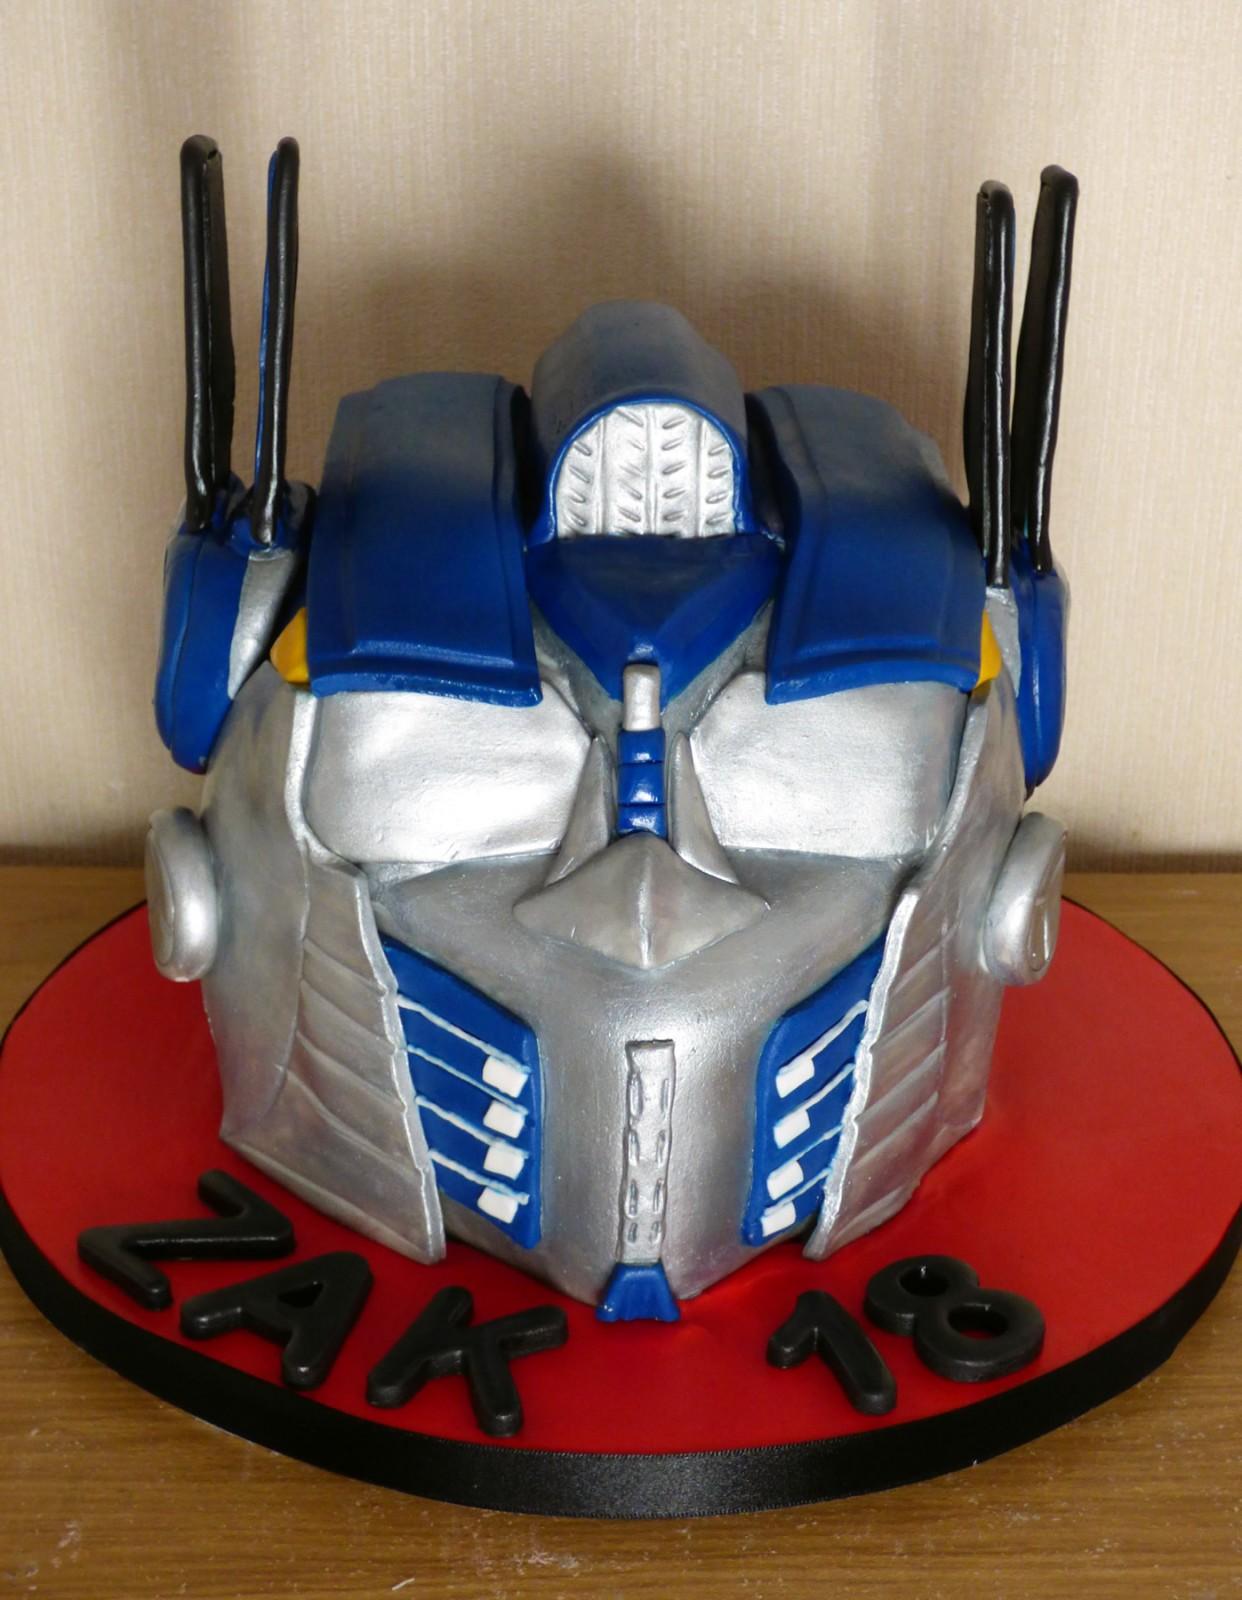 Remarkable Optimus Transformer Birthday Cake Susies Cakes Funny Birthday Cards Online Inifofree Goldxyz